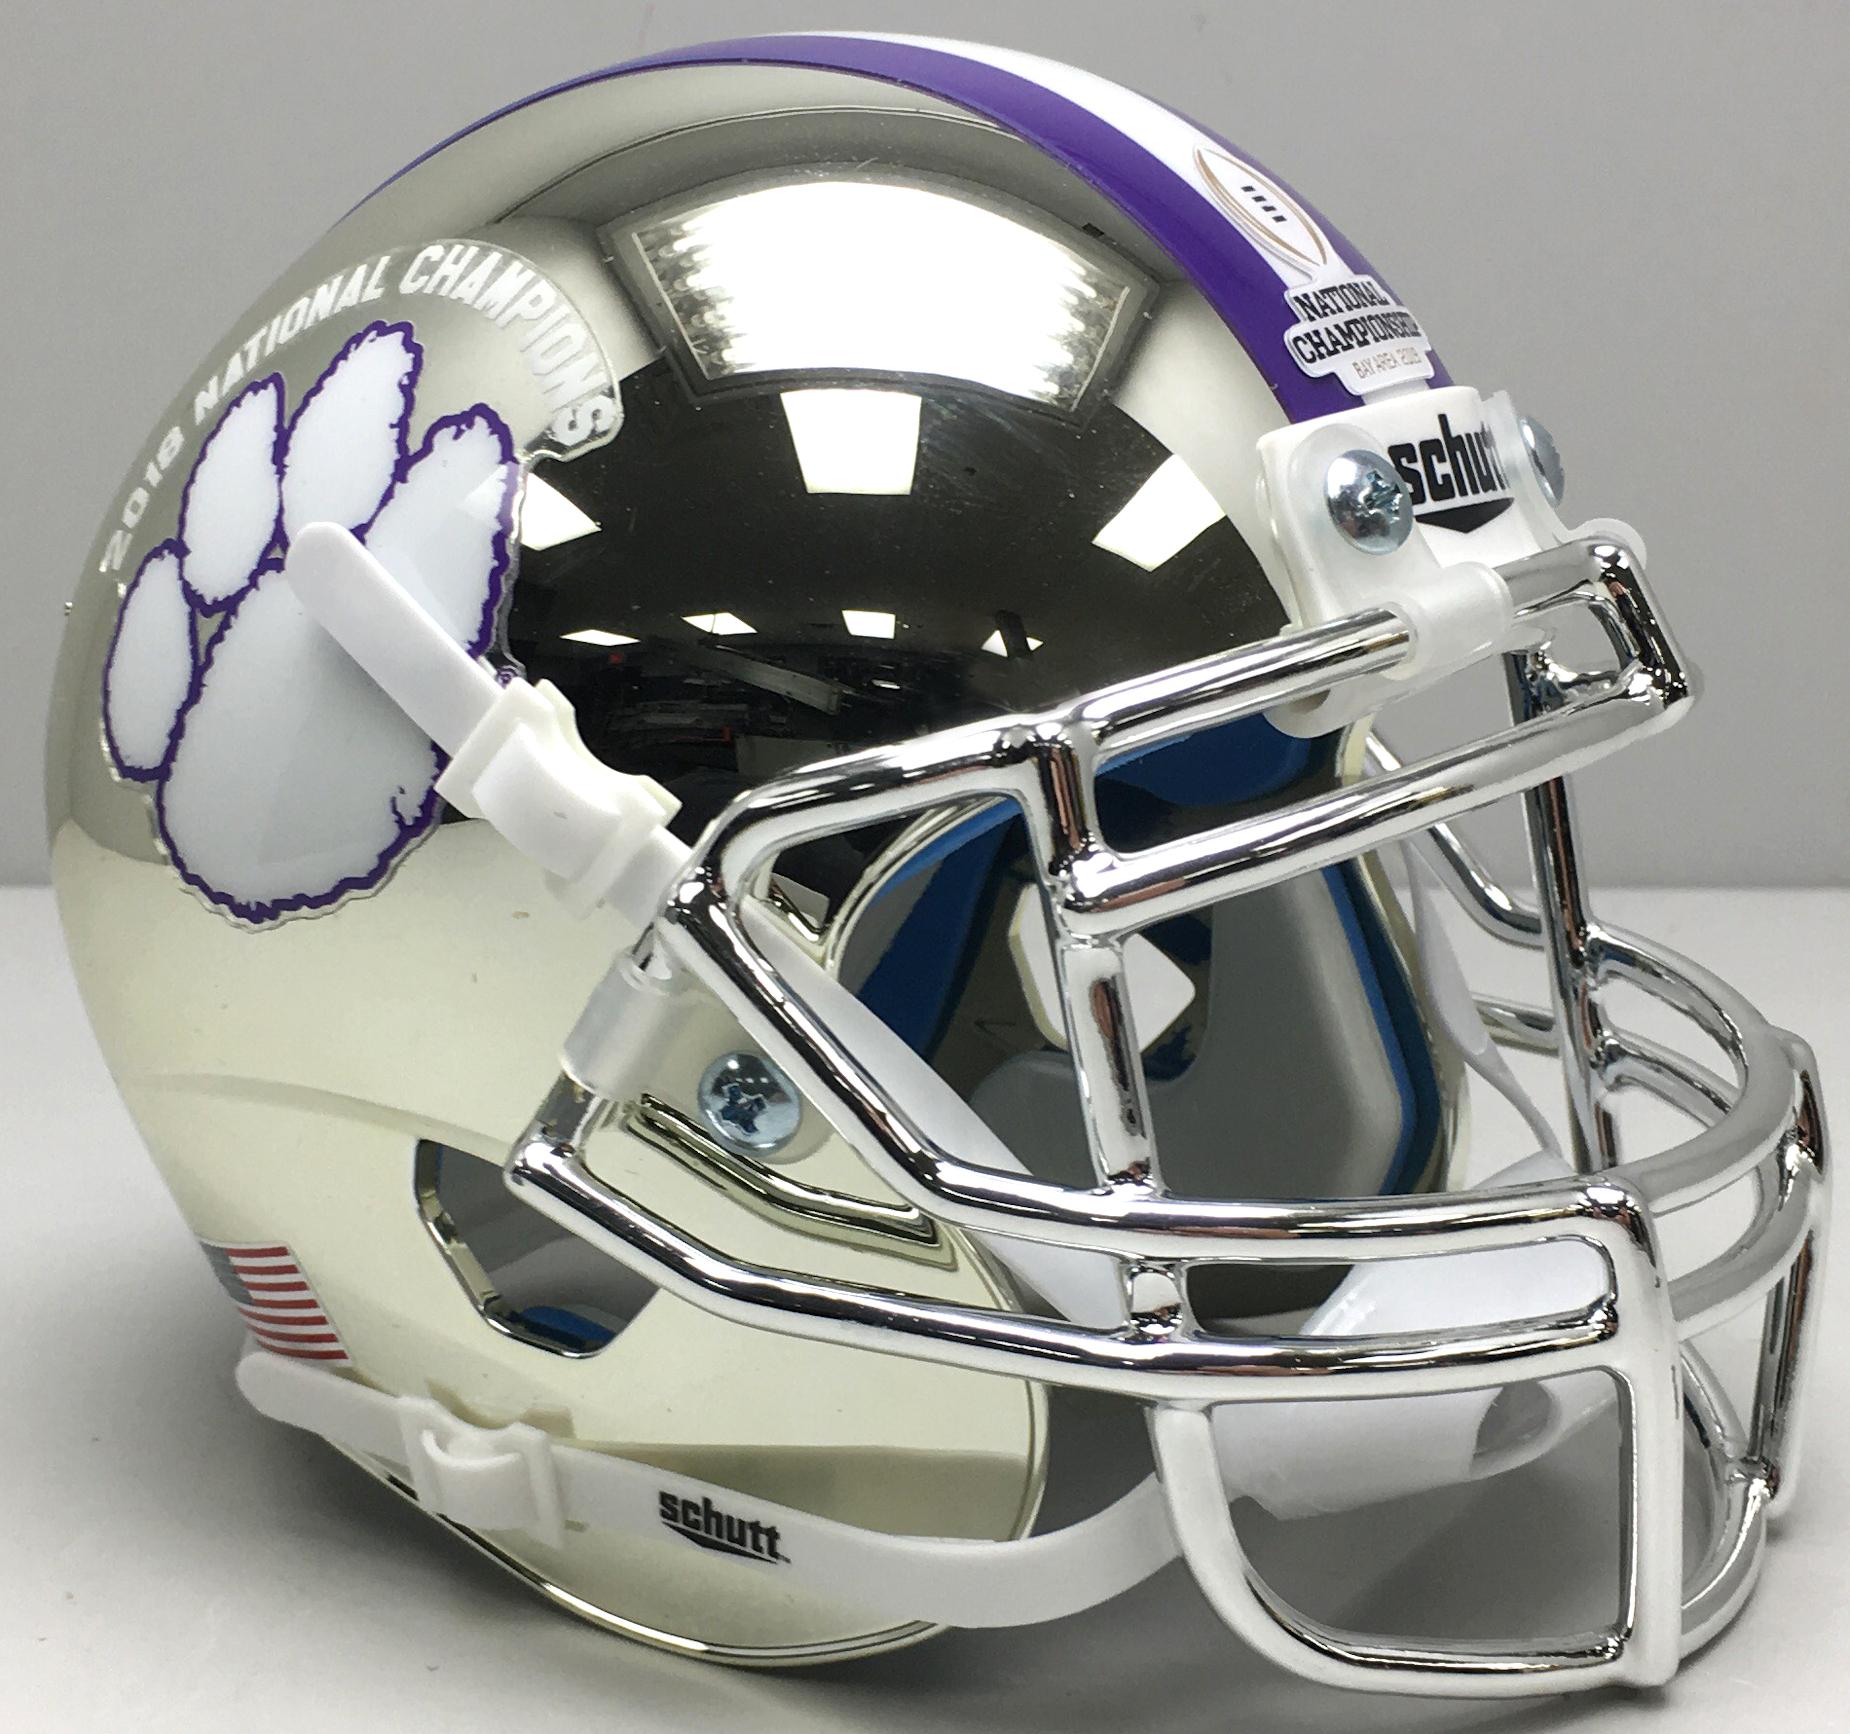 Clemson Tigers Authentic Football Helmet <B>2018 National Champs Silver Chrome</B>